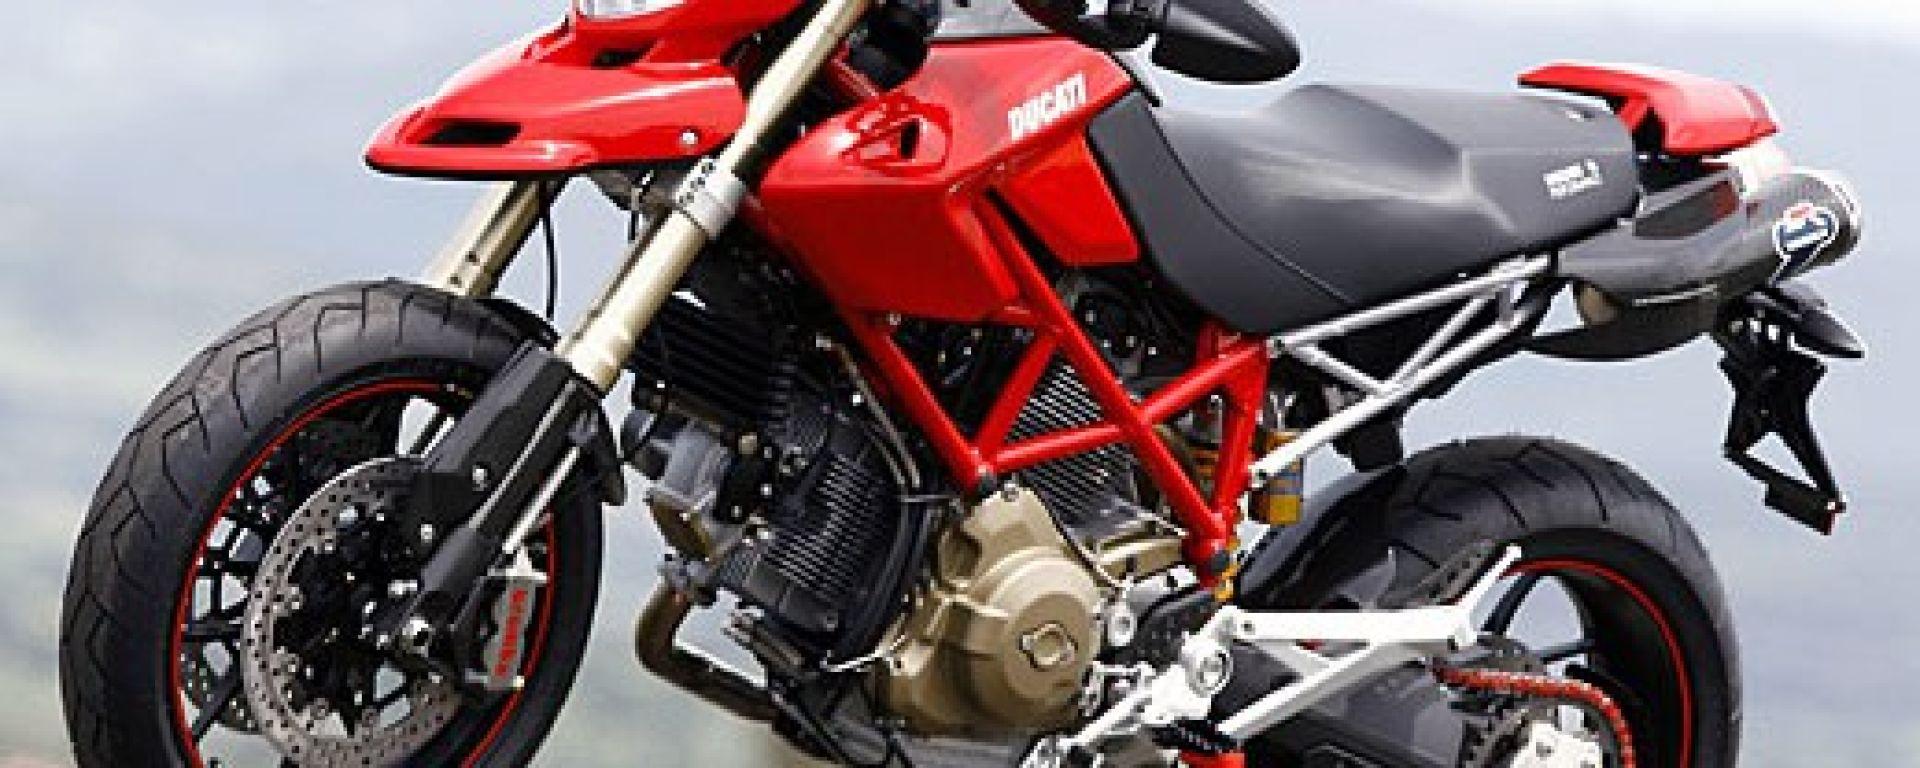 Prova: Ducati Hypermotard 1100 - MotorBox